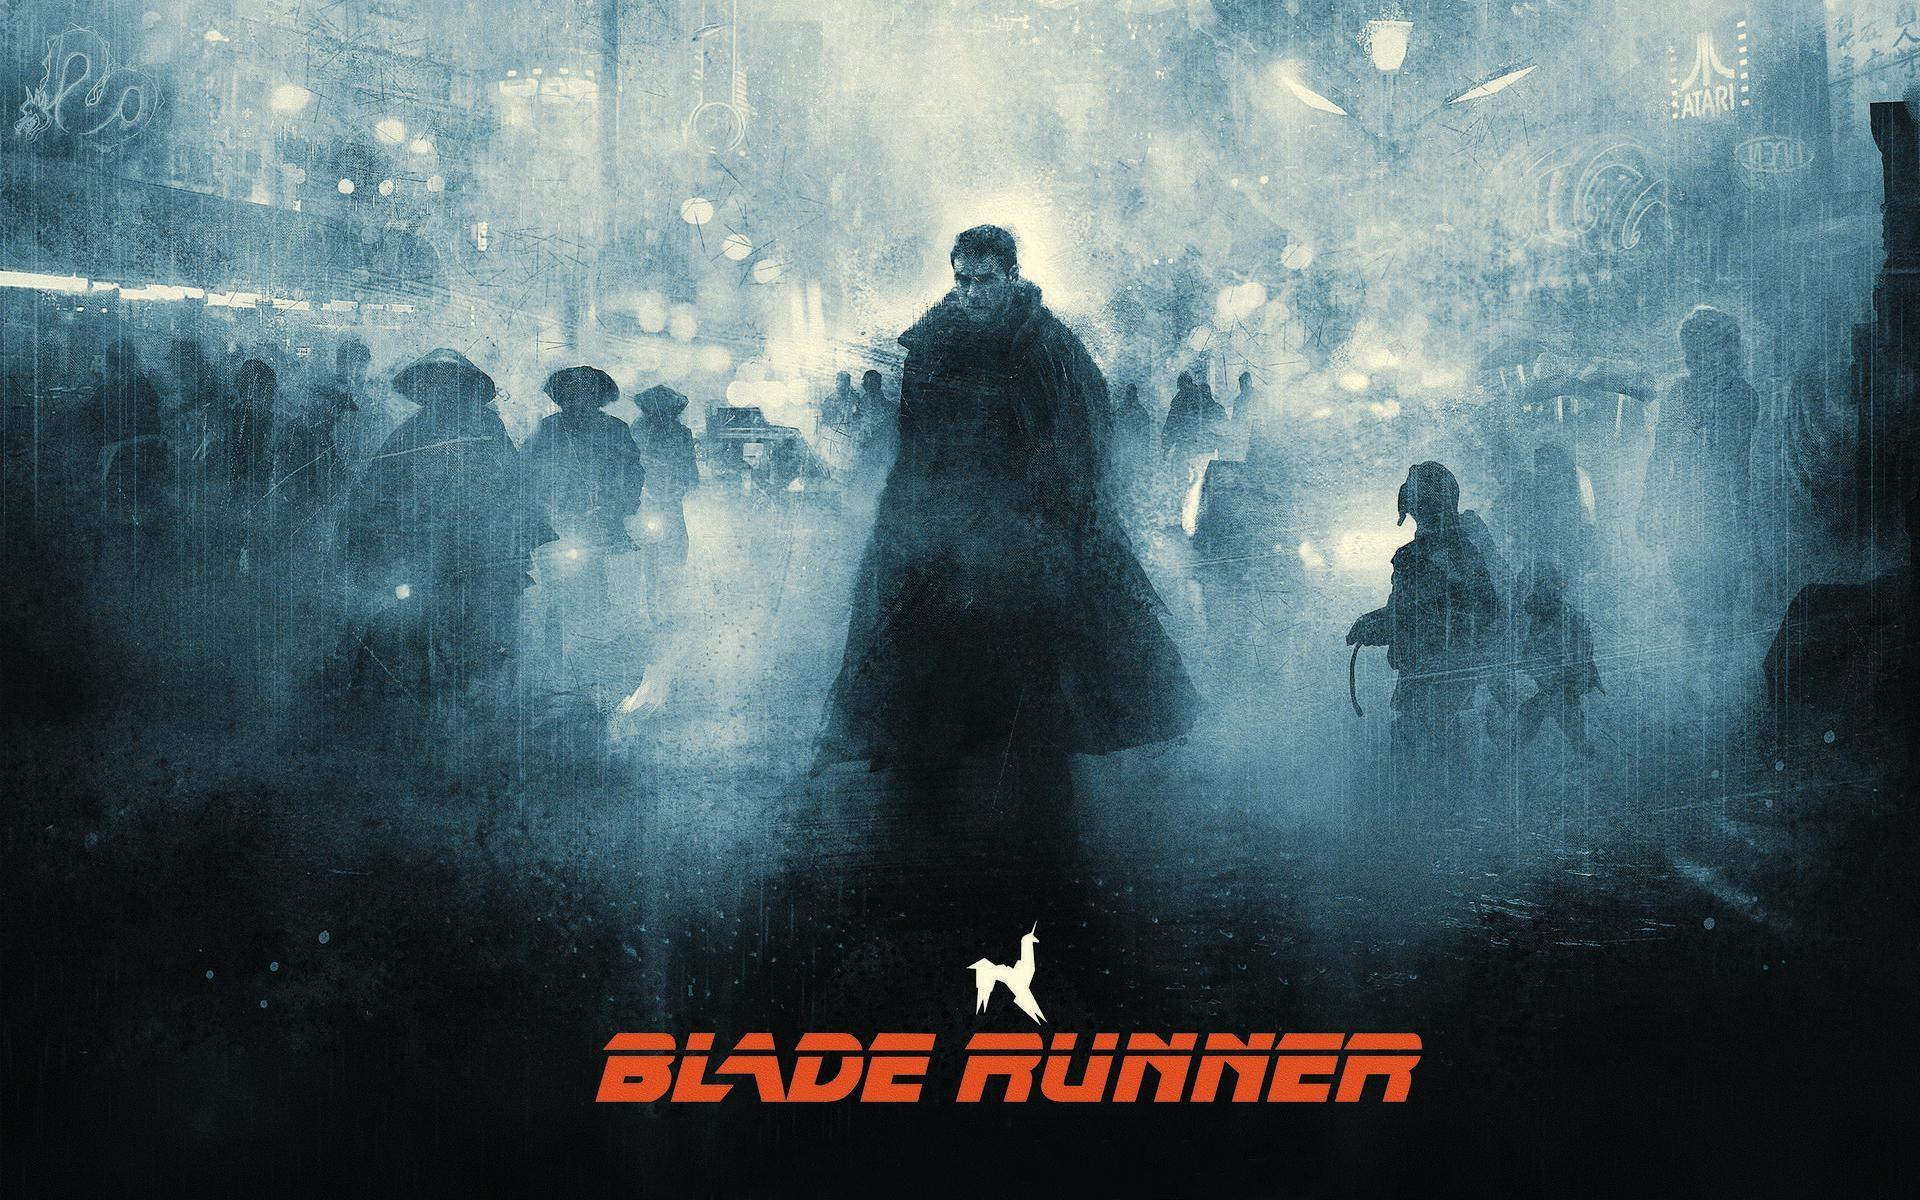 Free Download Blade Runner 2049 Wallpaper 15 1920 X 1200 Stmednet